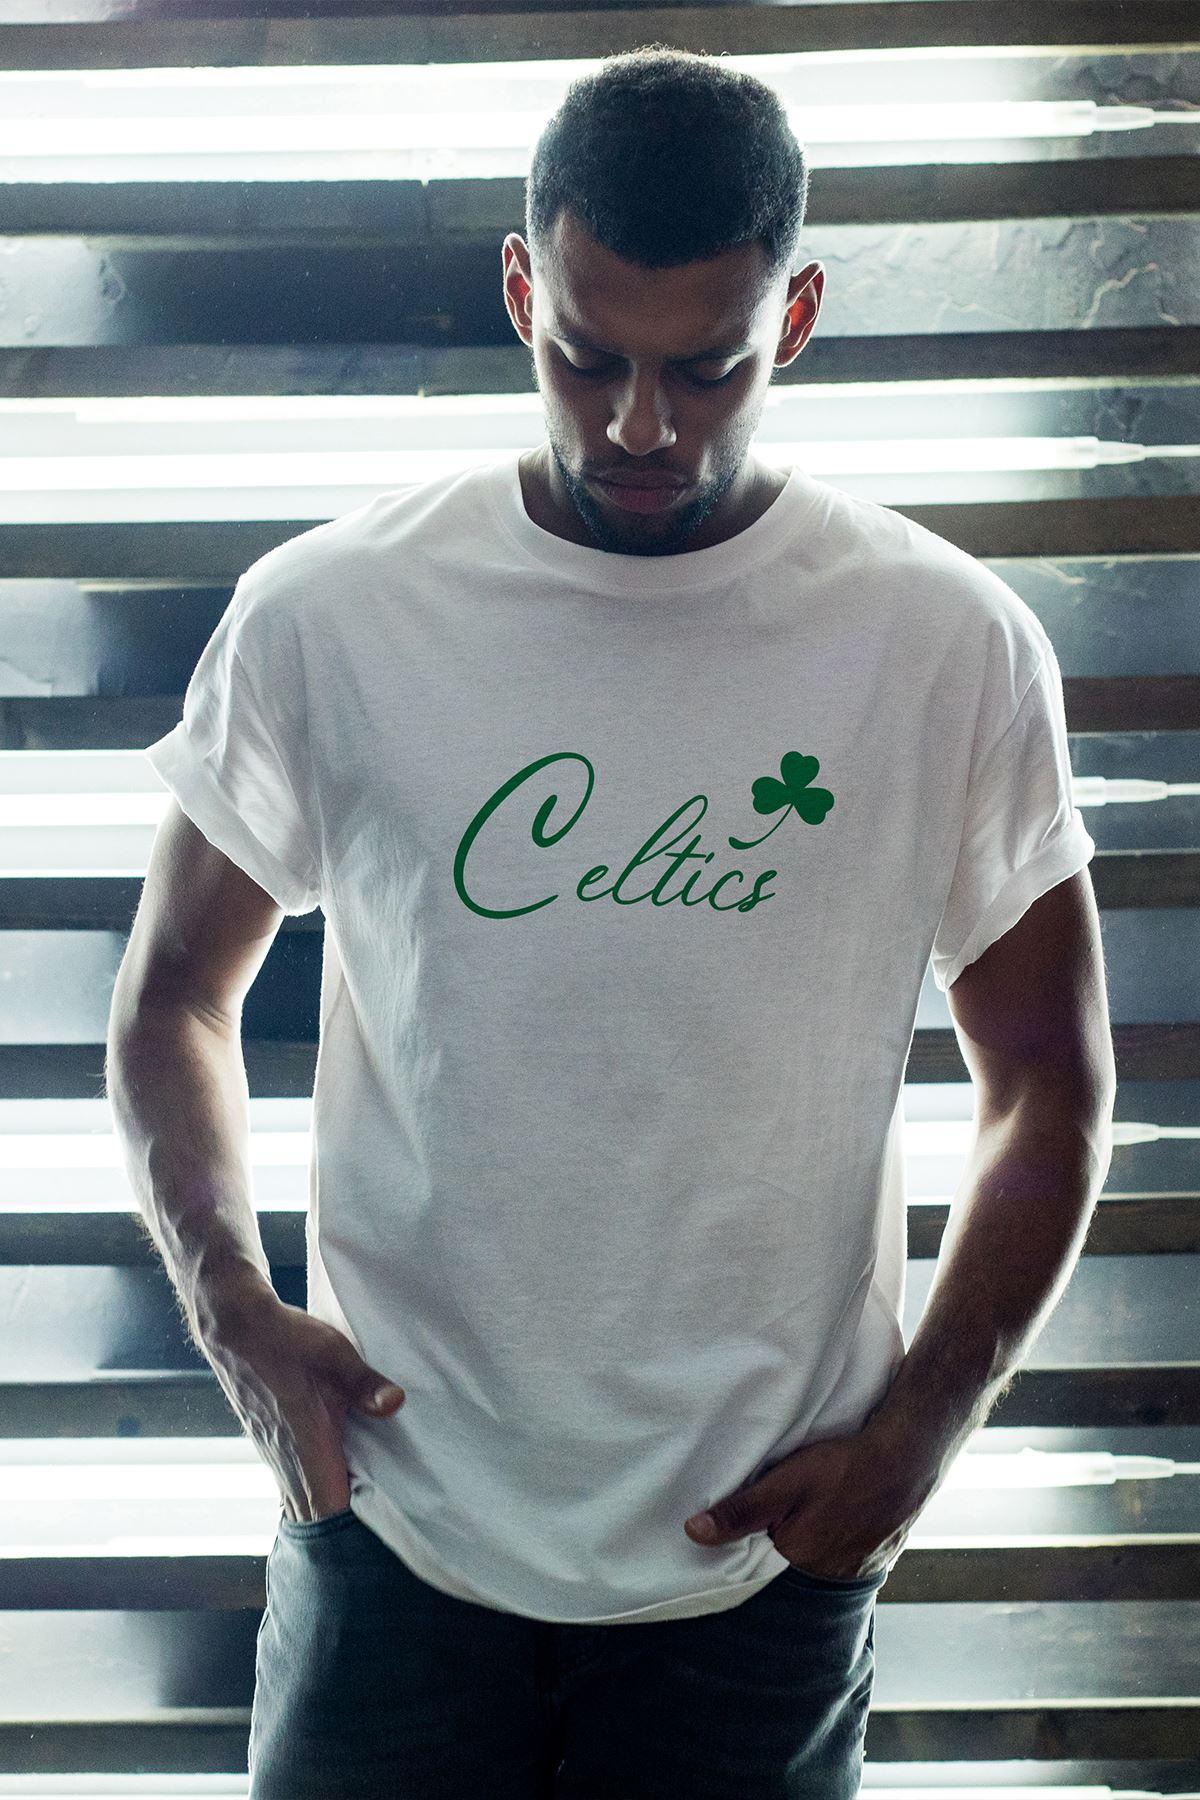 Boston Celtics 28 Beyaz Erkek Oversize Tshirt - Tişört